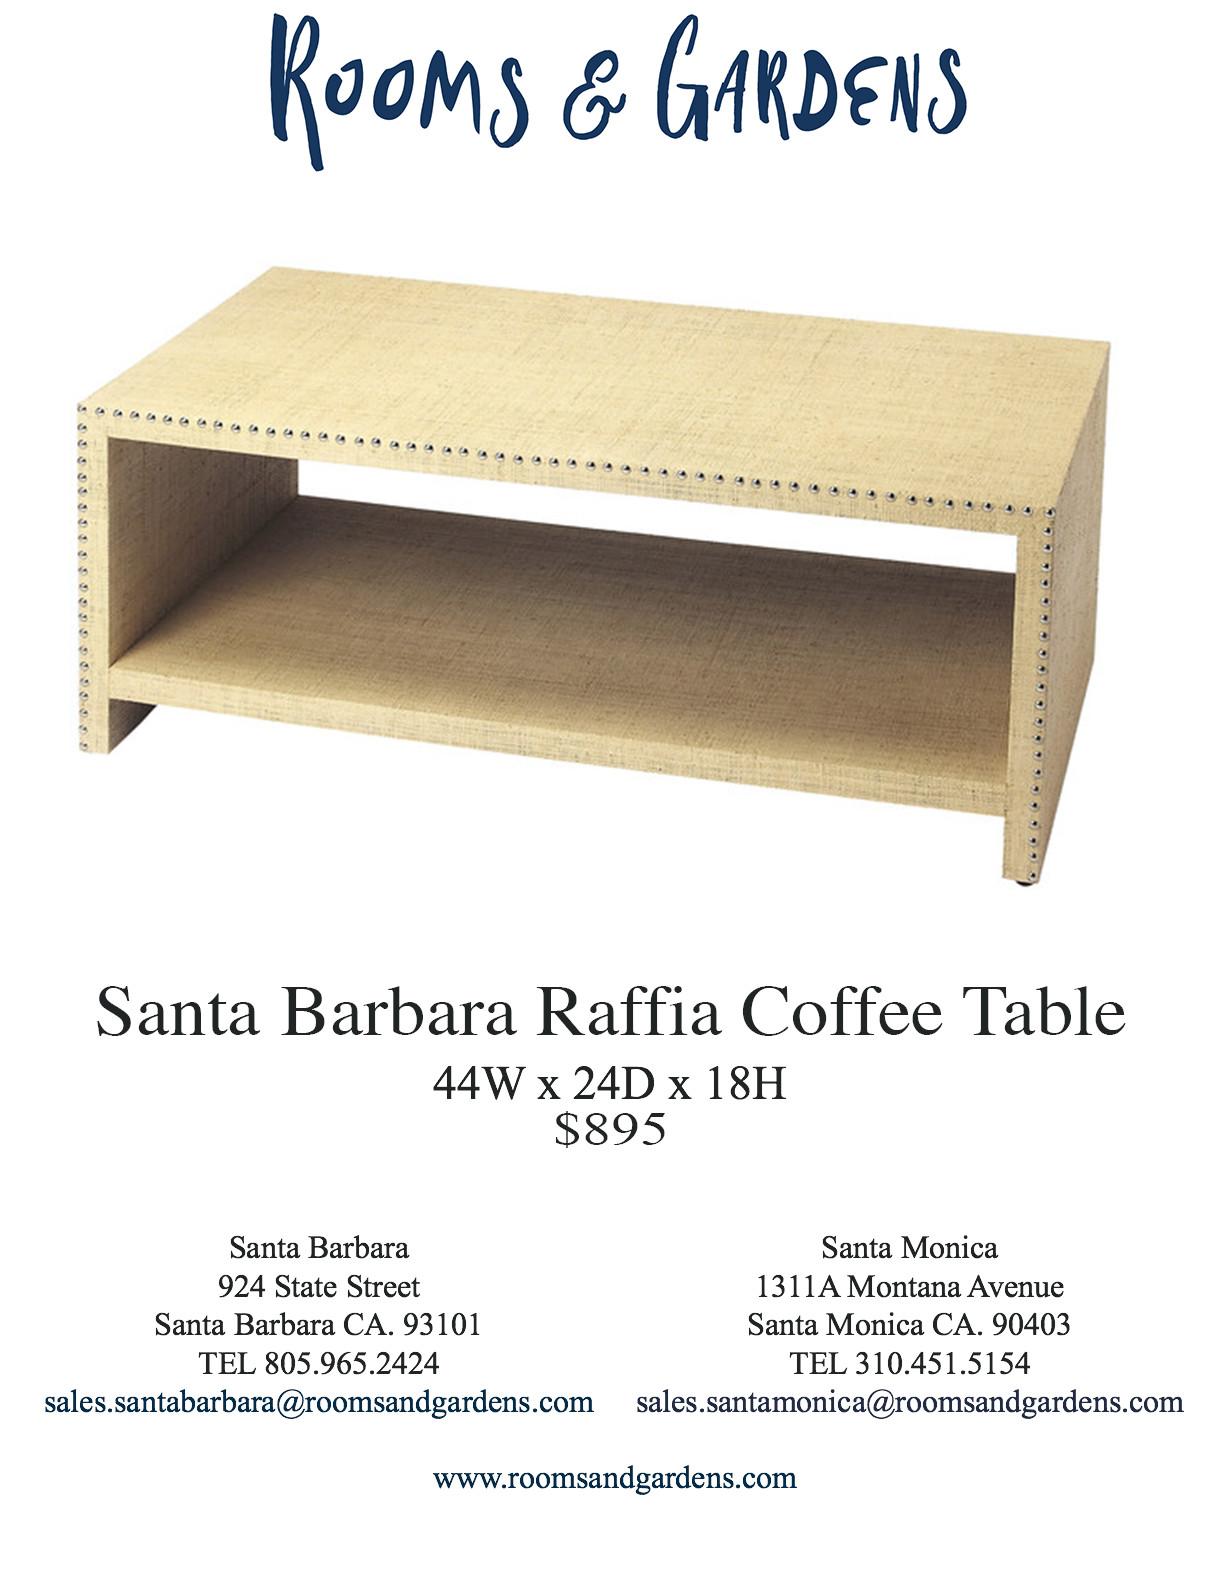 Santa Barbara Raffia Coffee Table